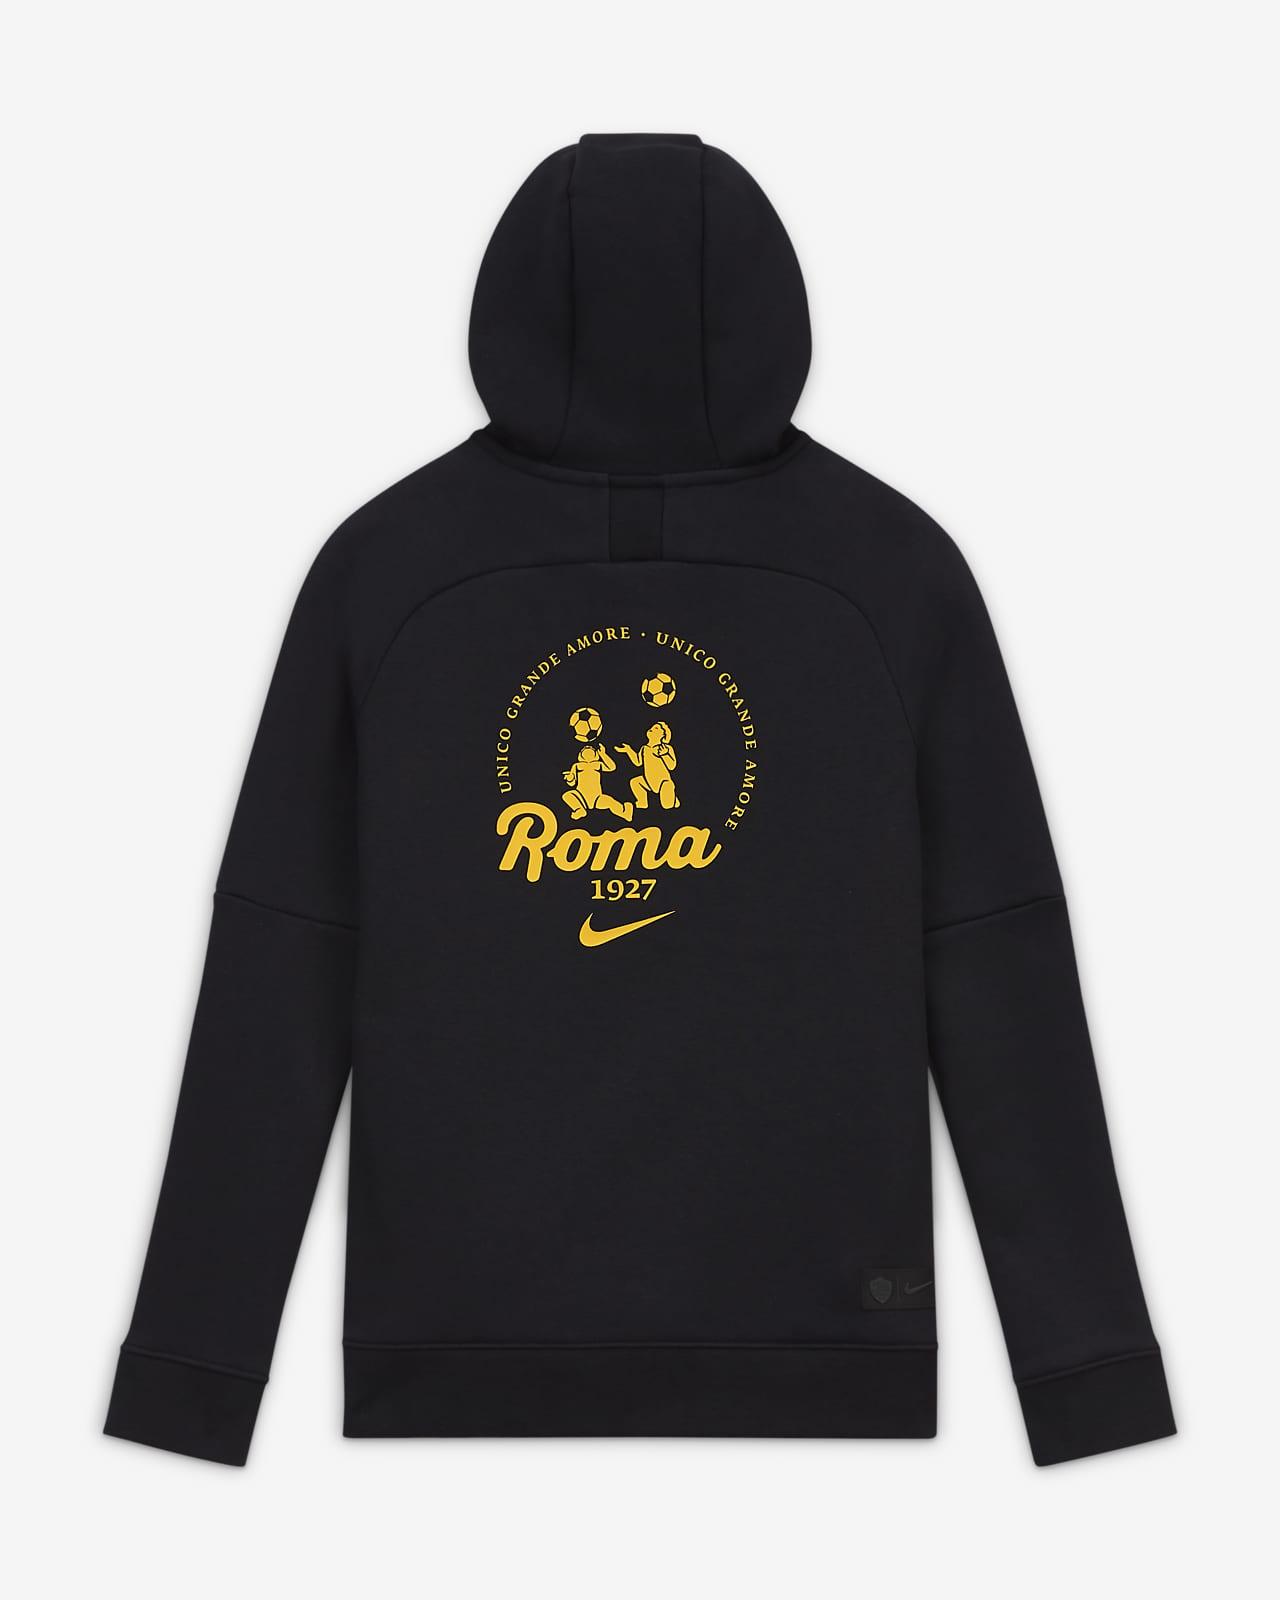 Felpa da calcio pullover in fleece con cappuccio AS Roma - Ragazzi